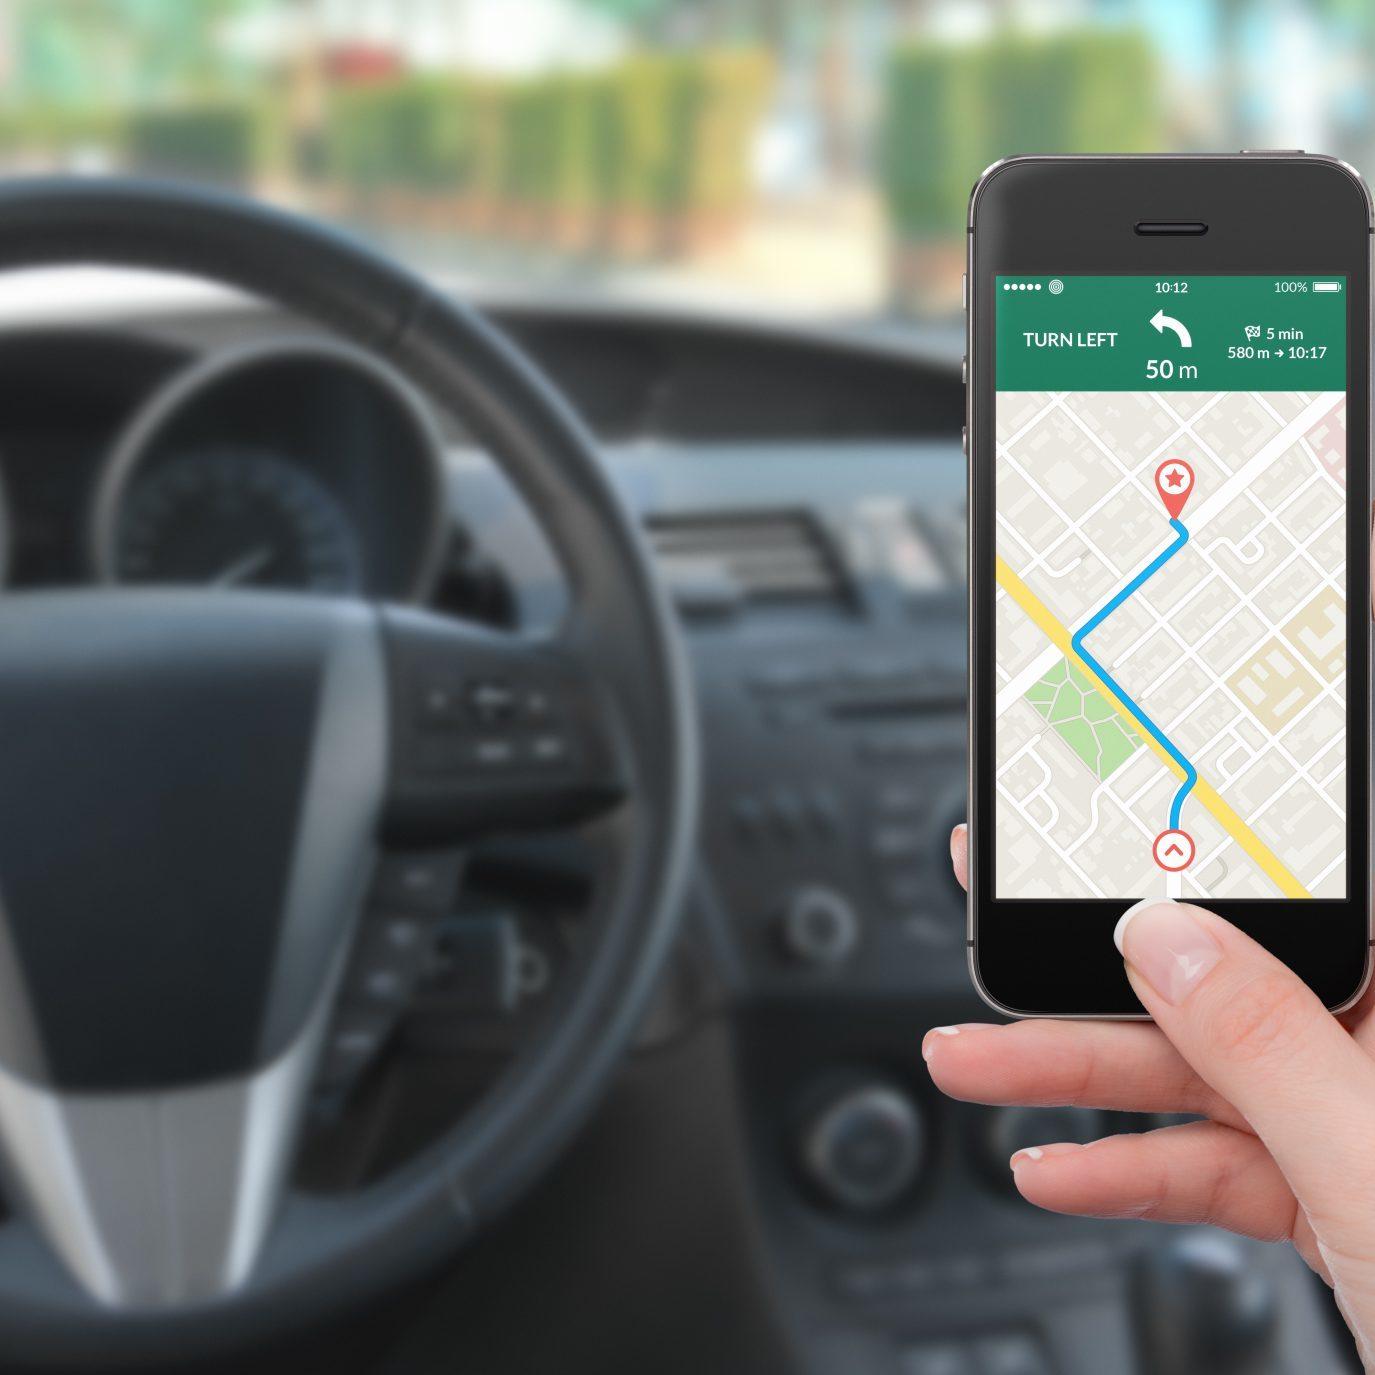 bigstock-Smartphone-With-Map-Gps-Naviga-73713238